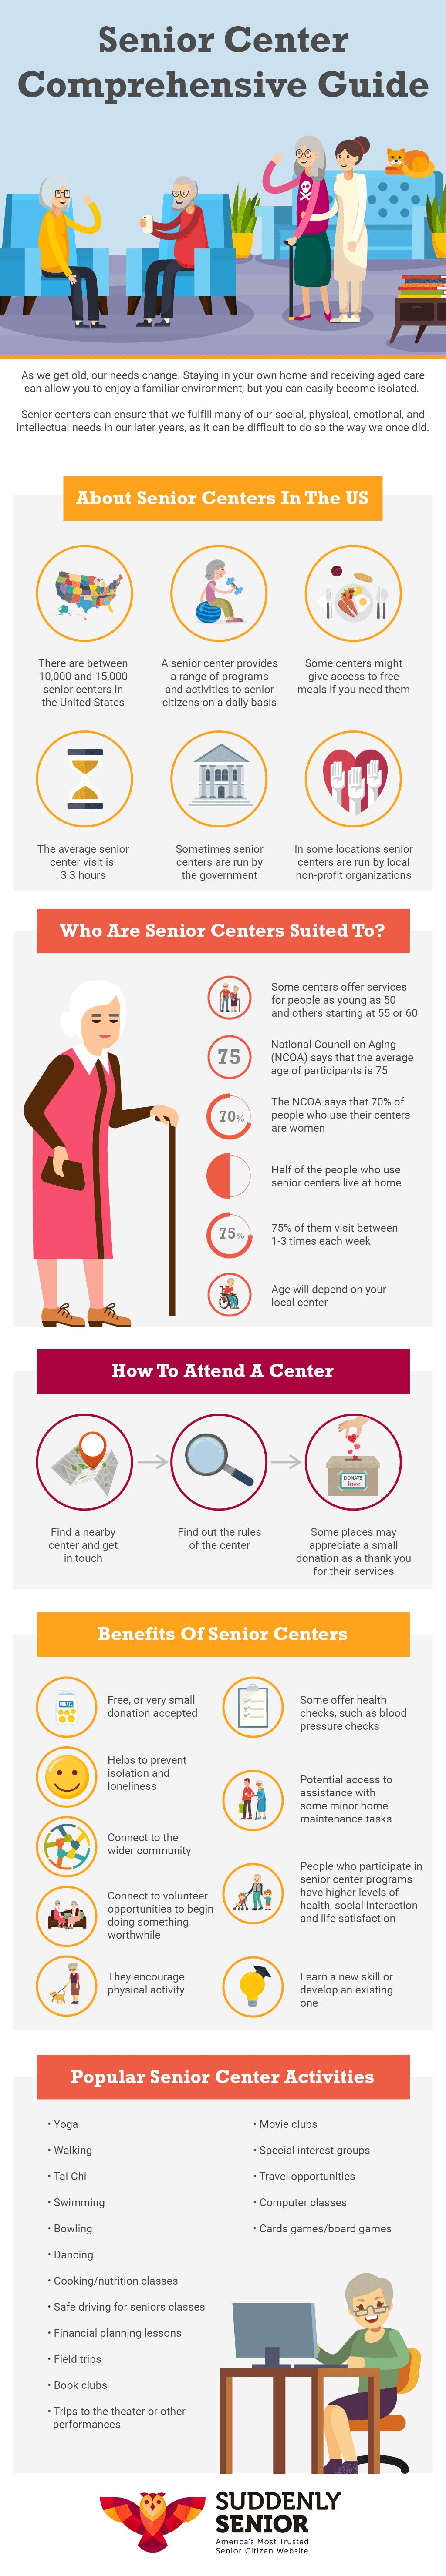 Suddenly-Senior-Center-Comprehensive-Guide.png